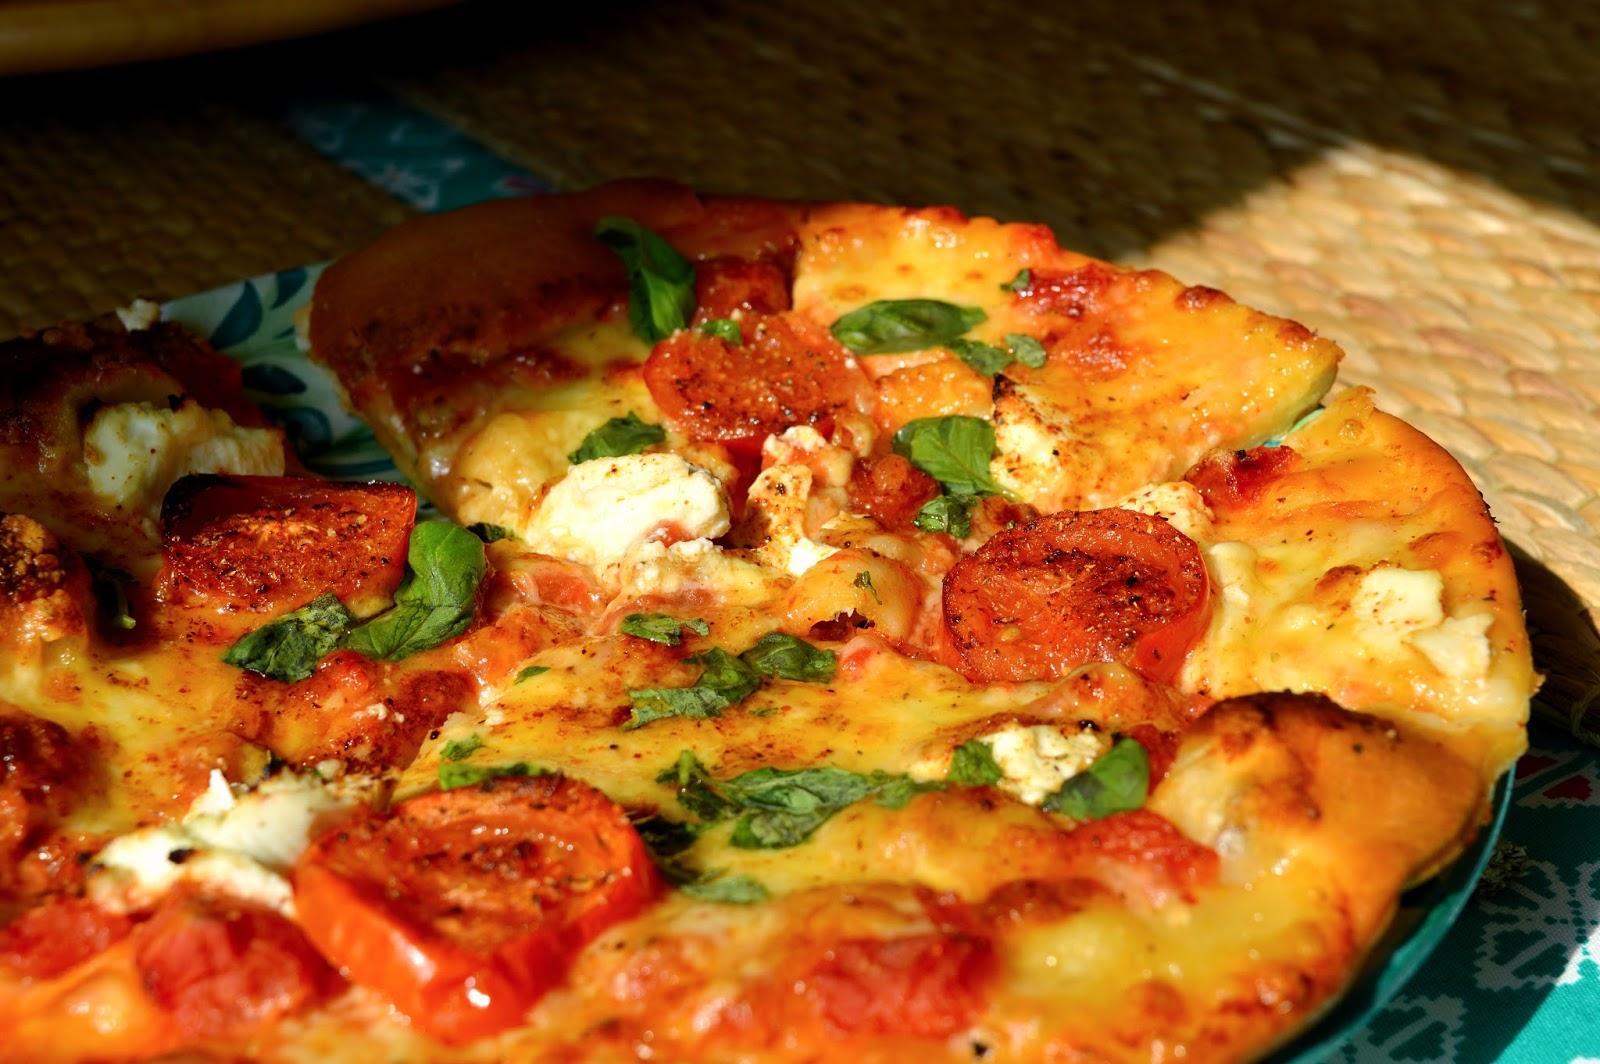 Homemade tomato and basil pizza